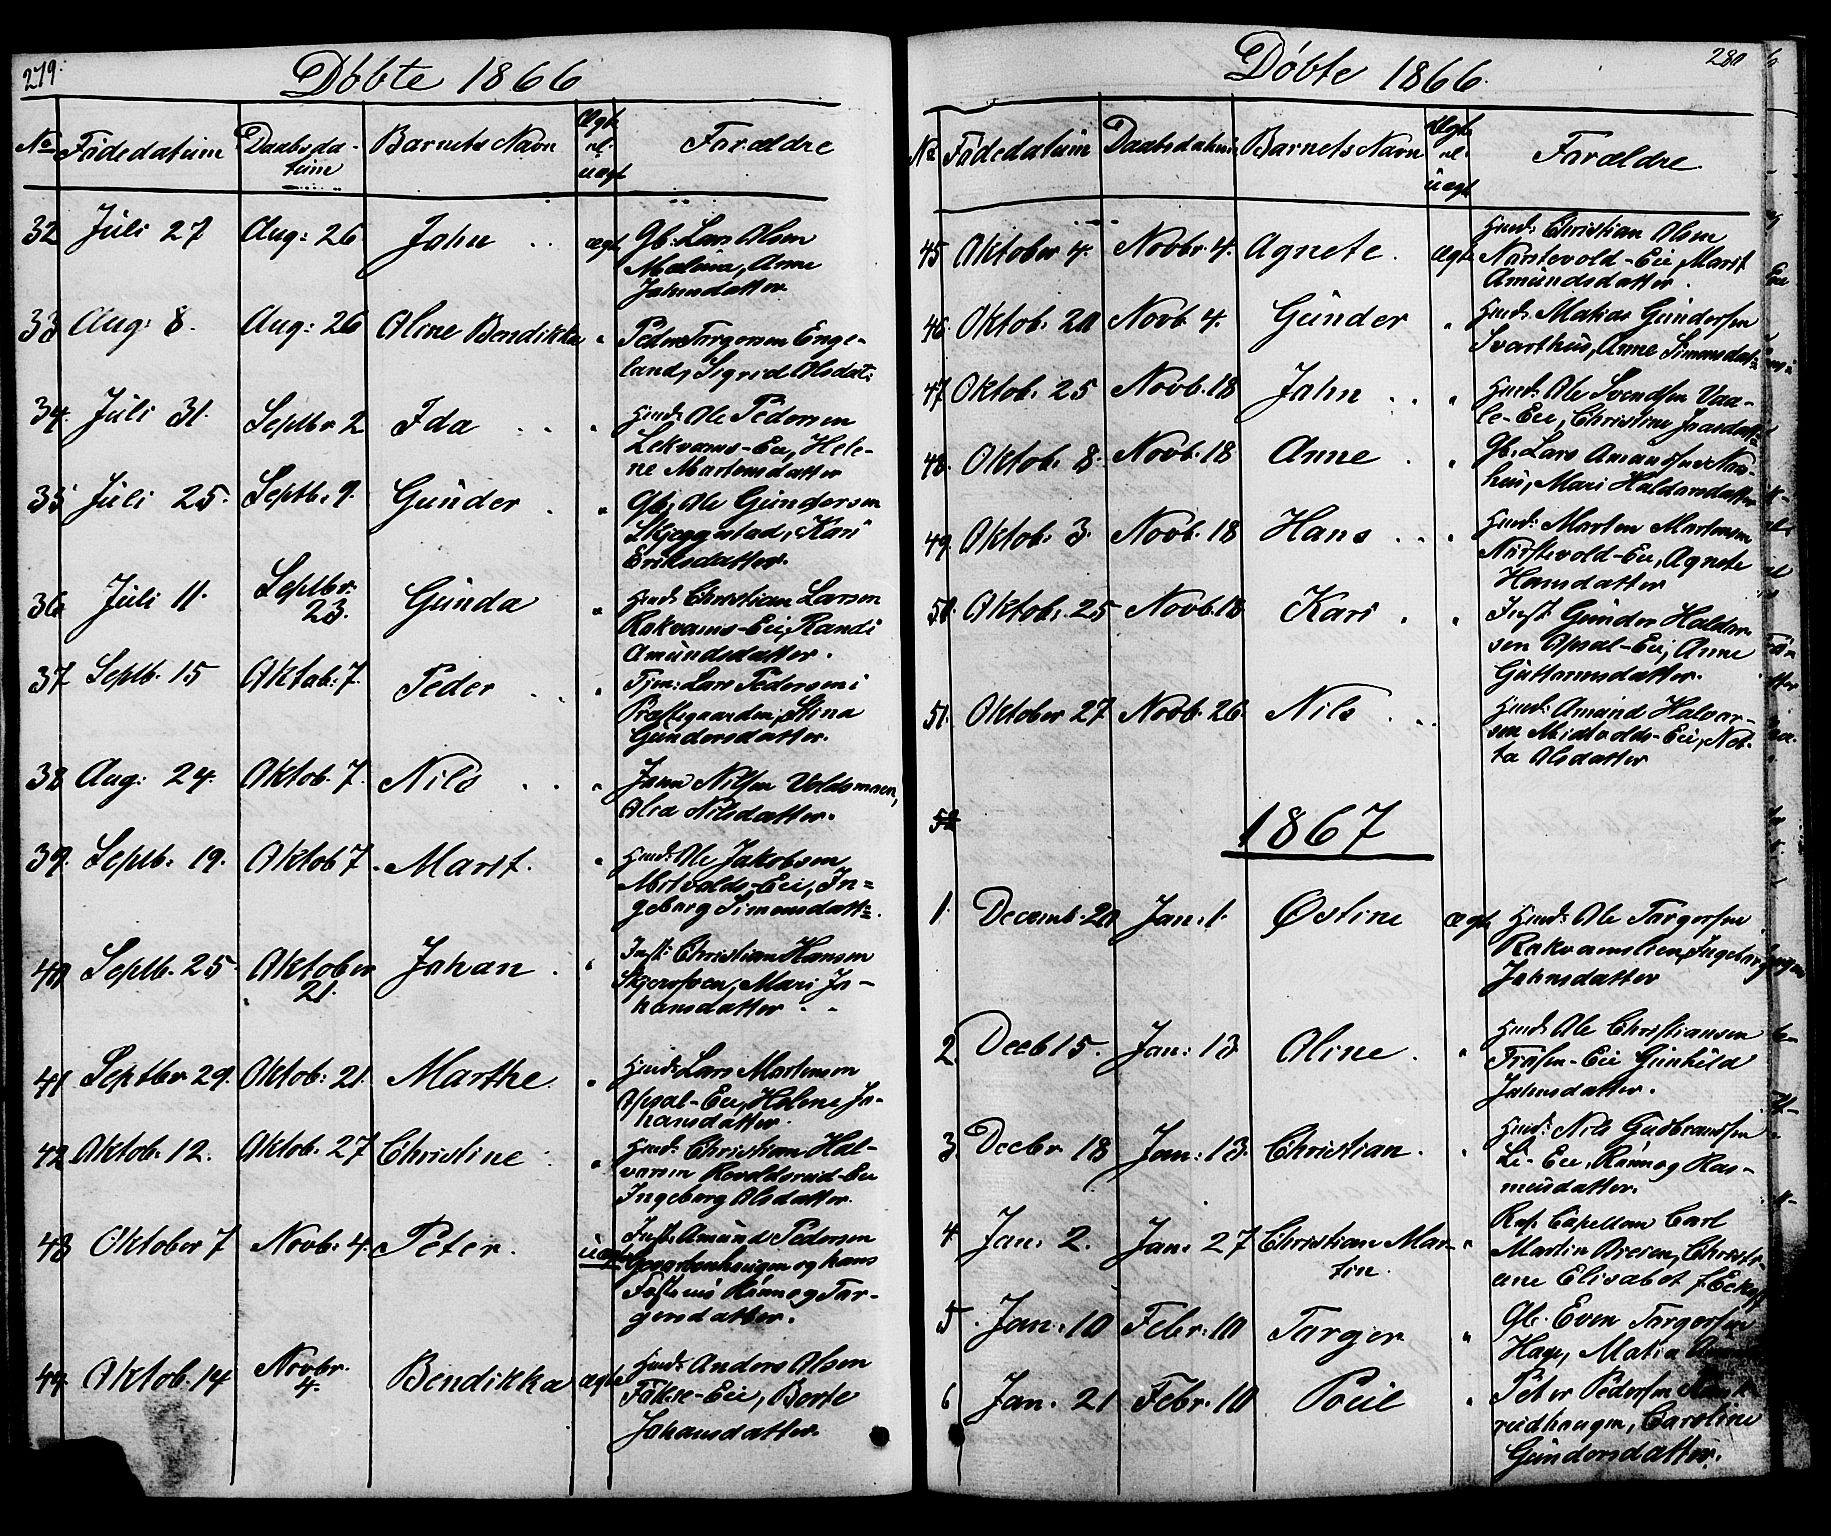 SAH, Østre Gausdal prestekontor, Klokkerbok nr. 1, 1863-1893, s. 279-280